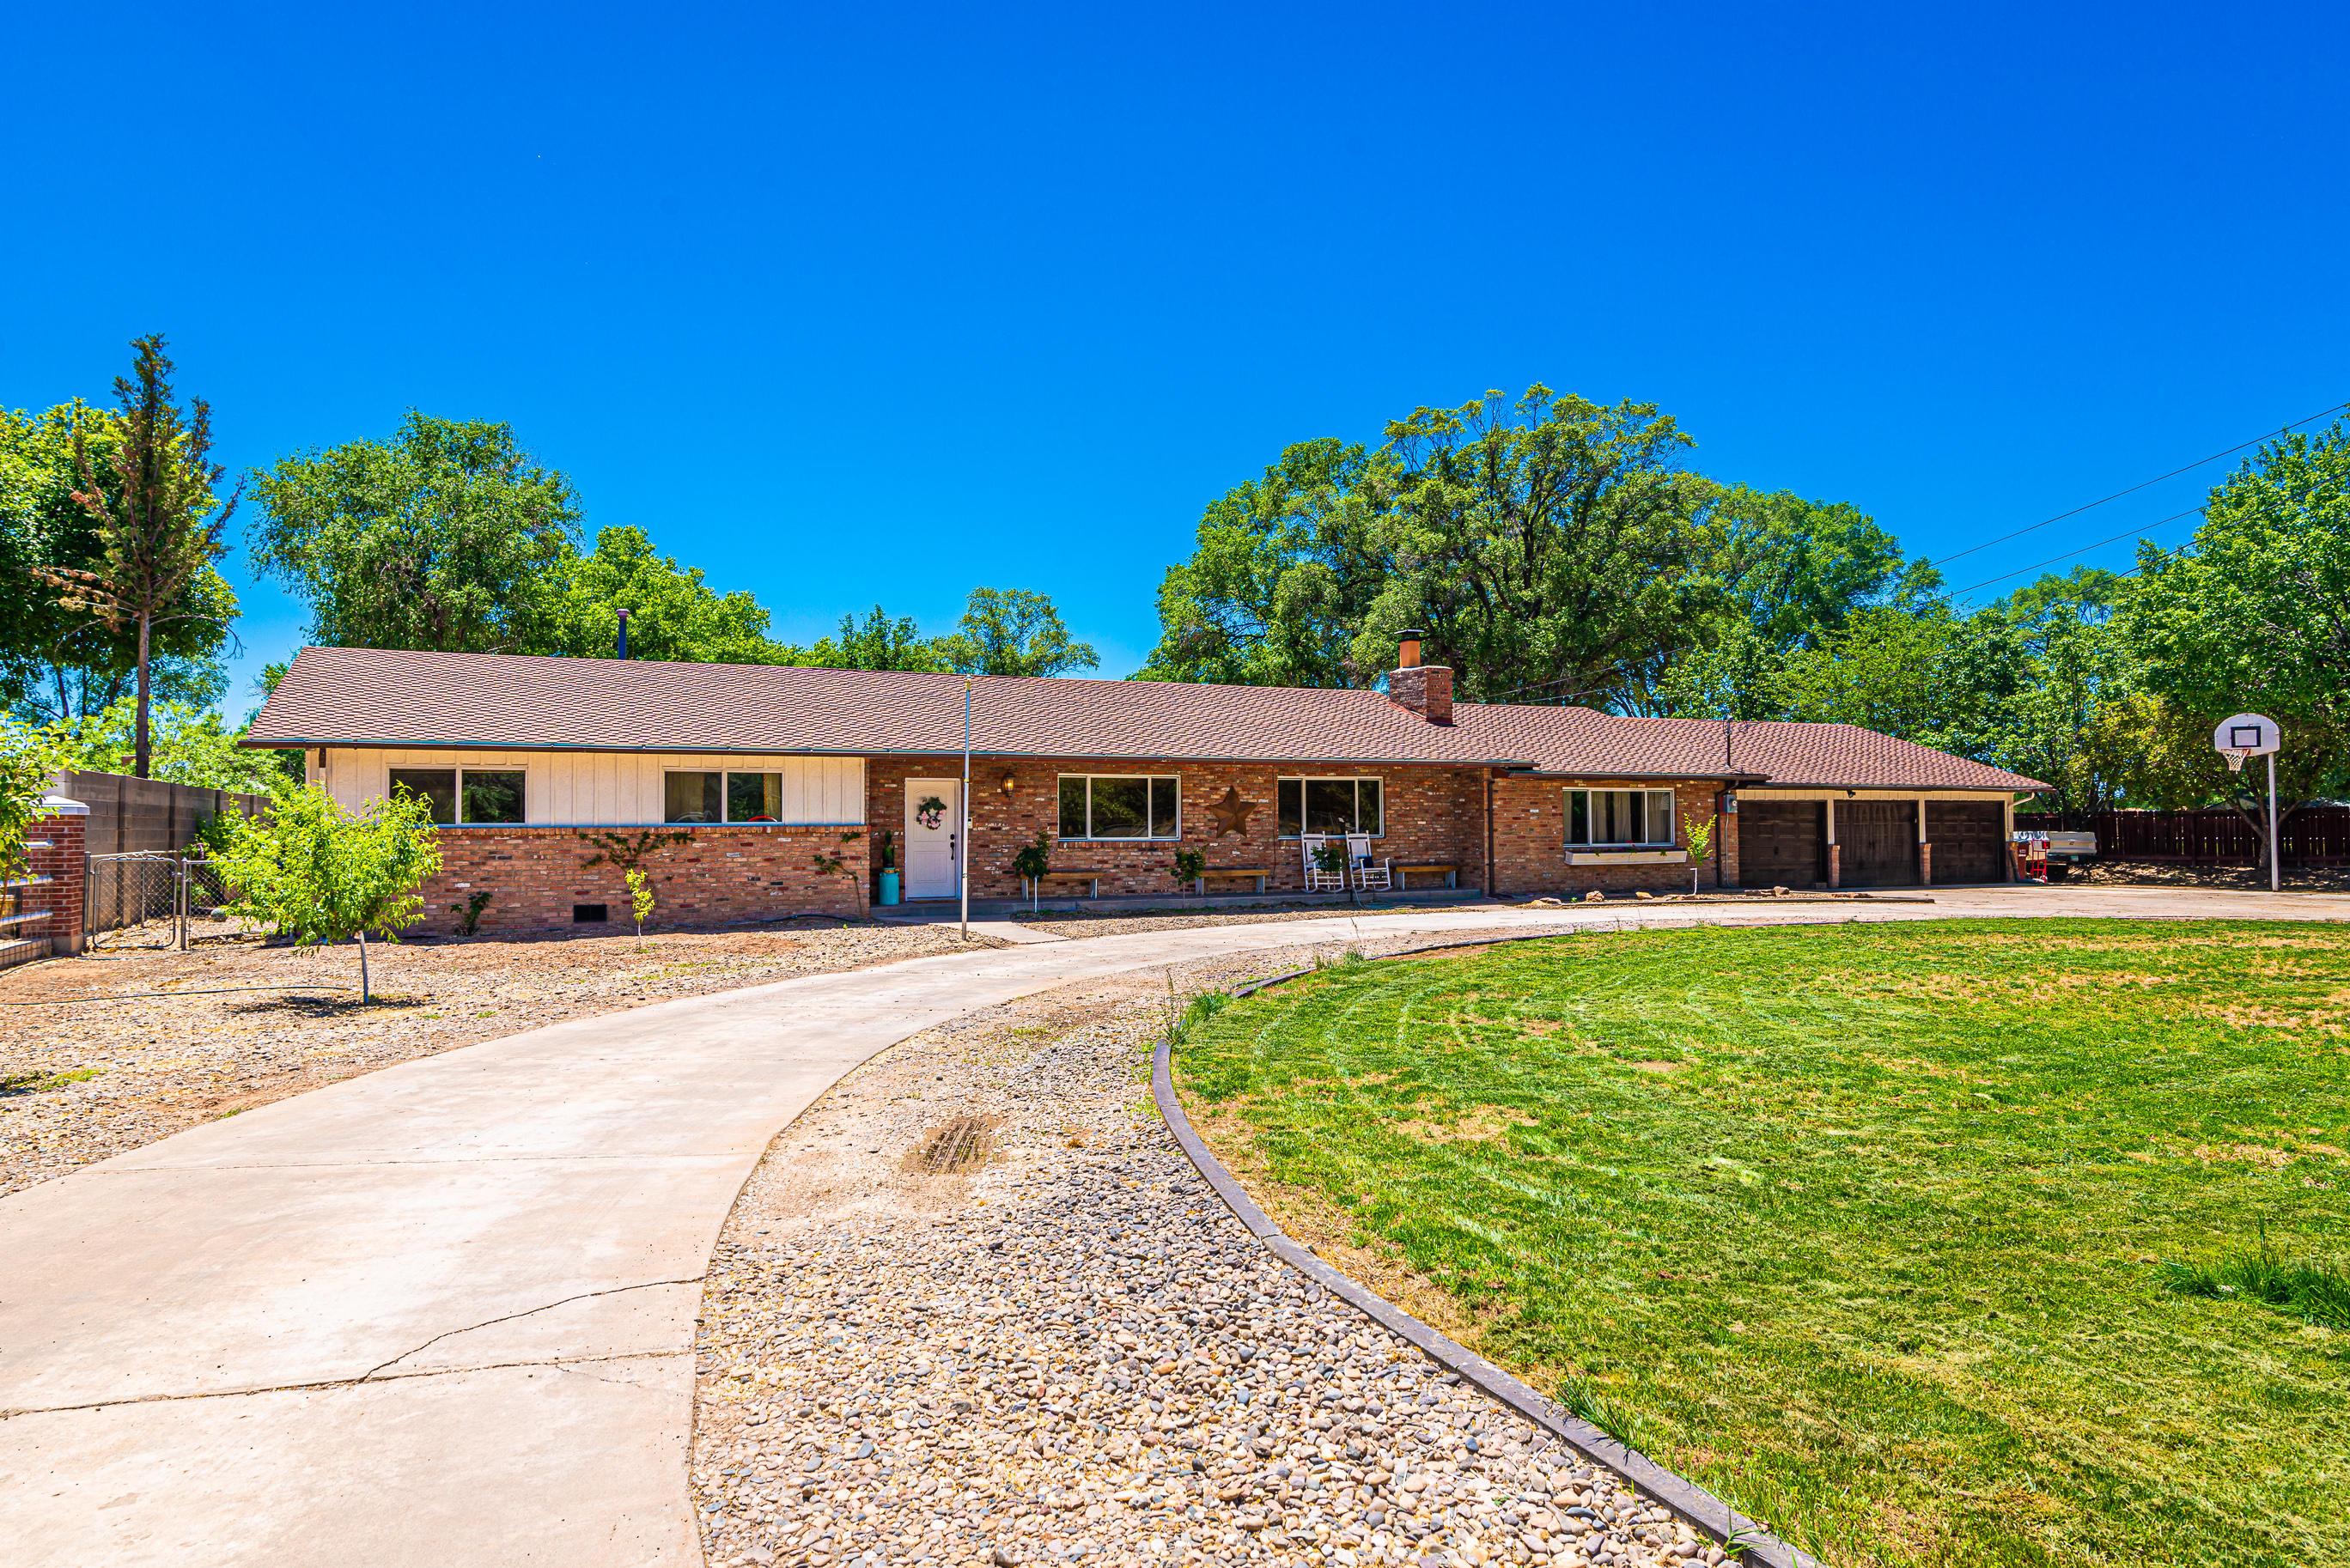 975 N Bosque Loop, Bosque Farms, NM 87068 - Bosque Farms, NM real estate listing